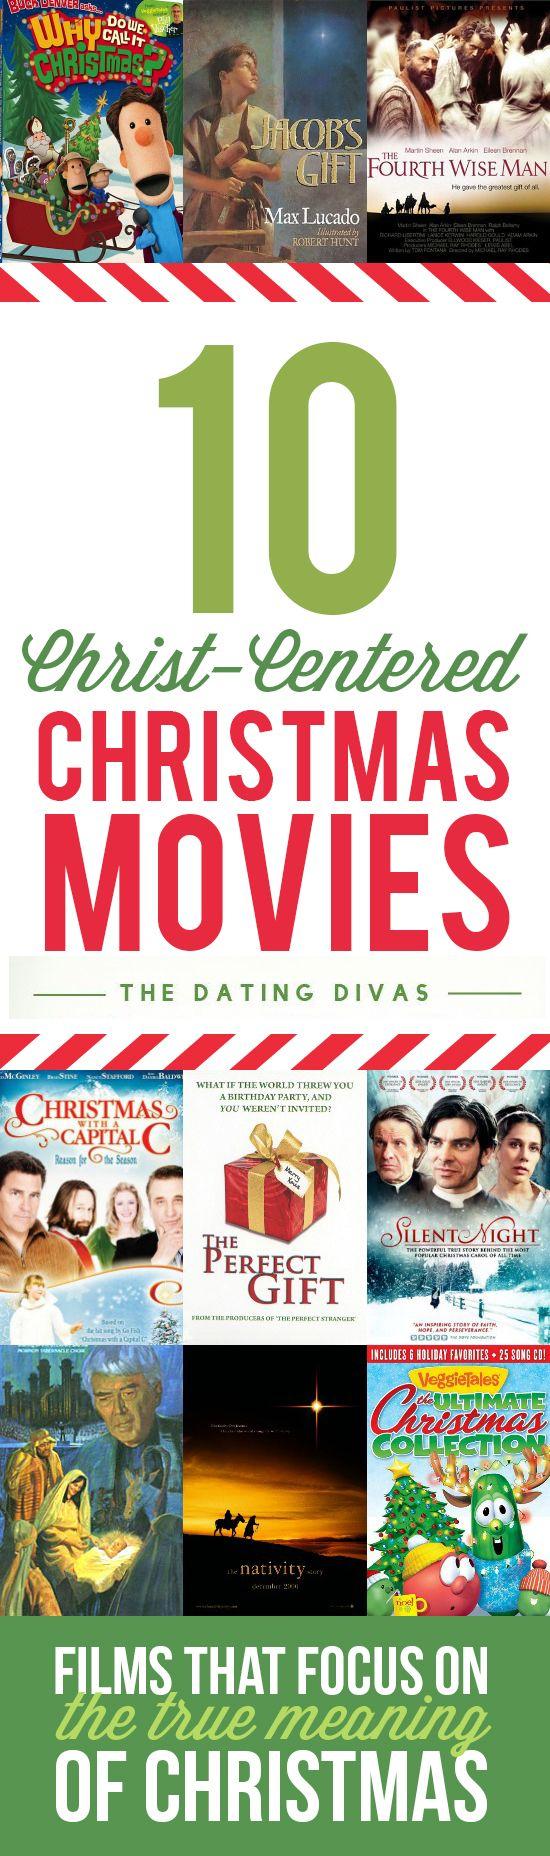 Christ-Centered Christmas Movies